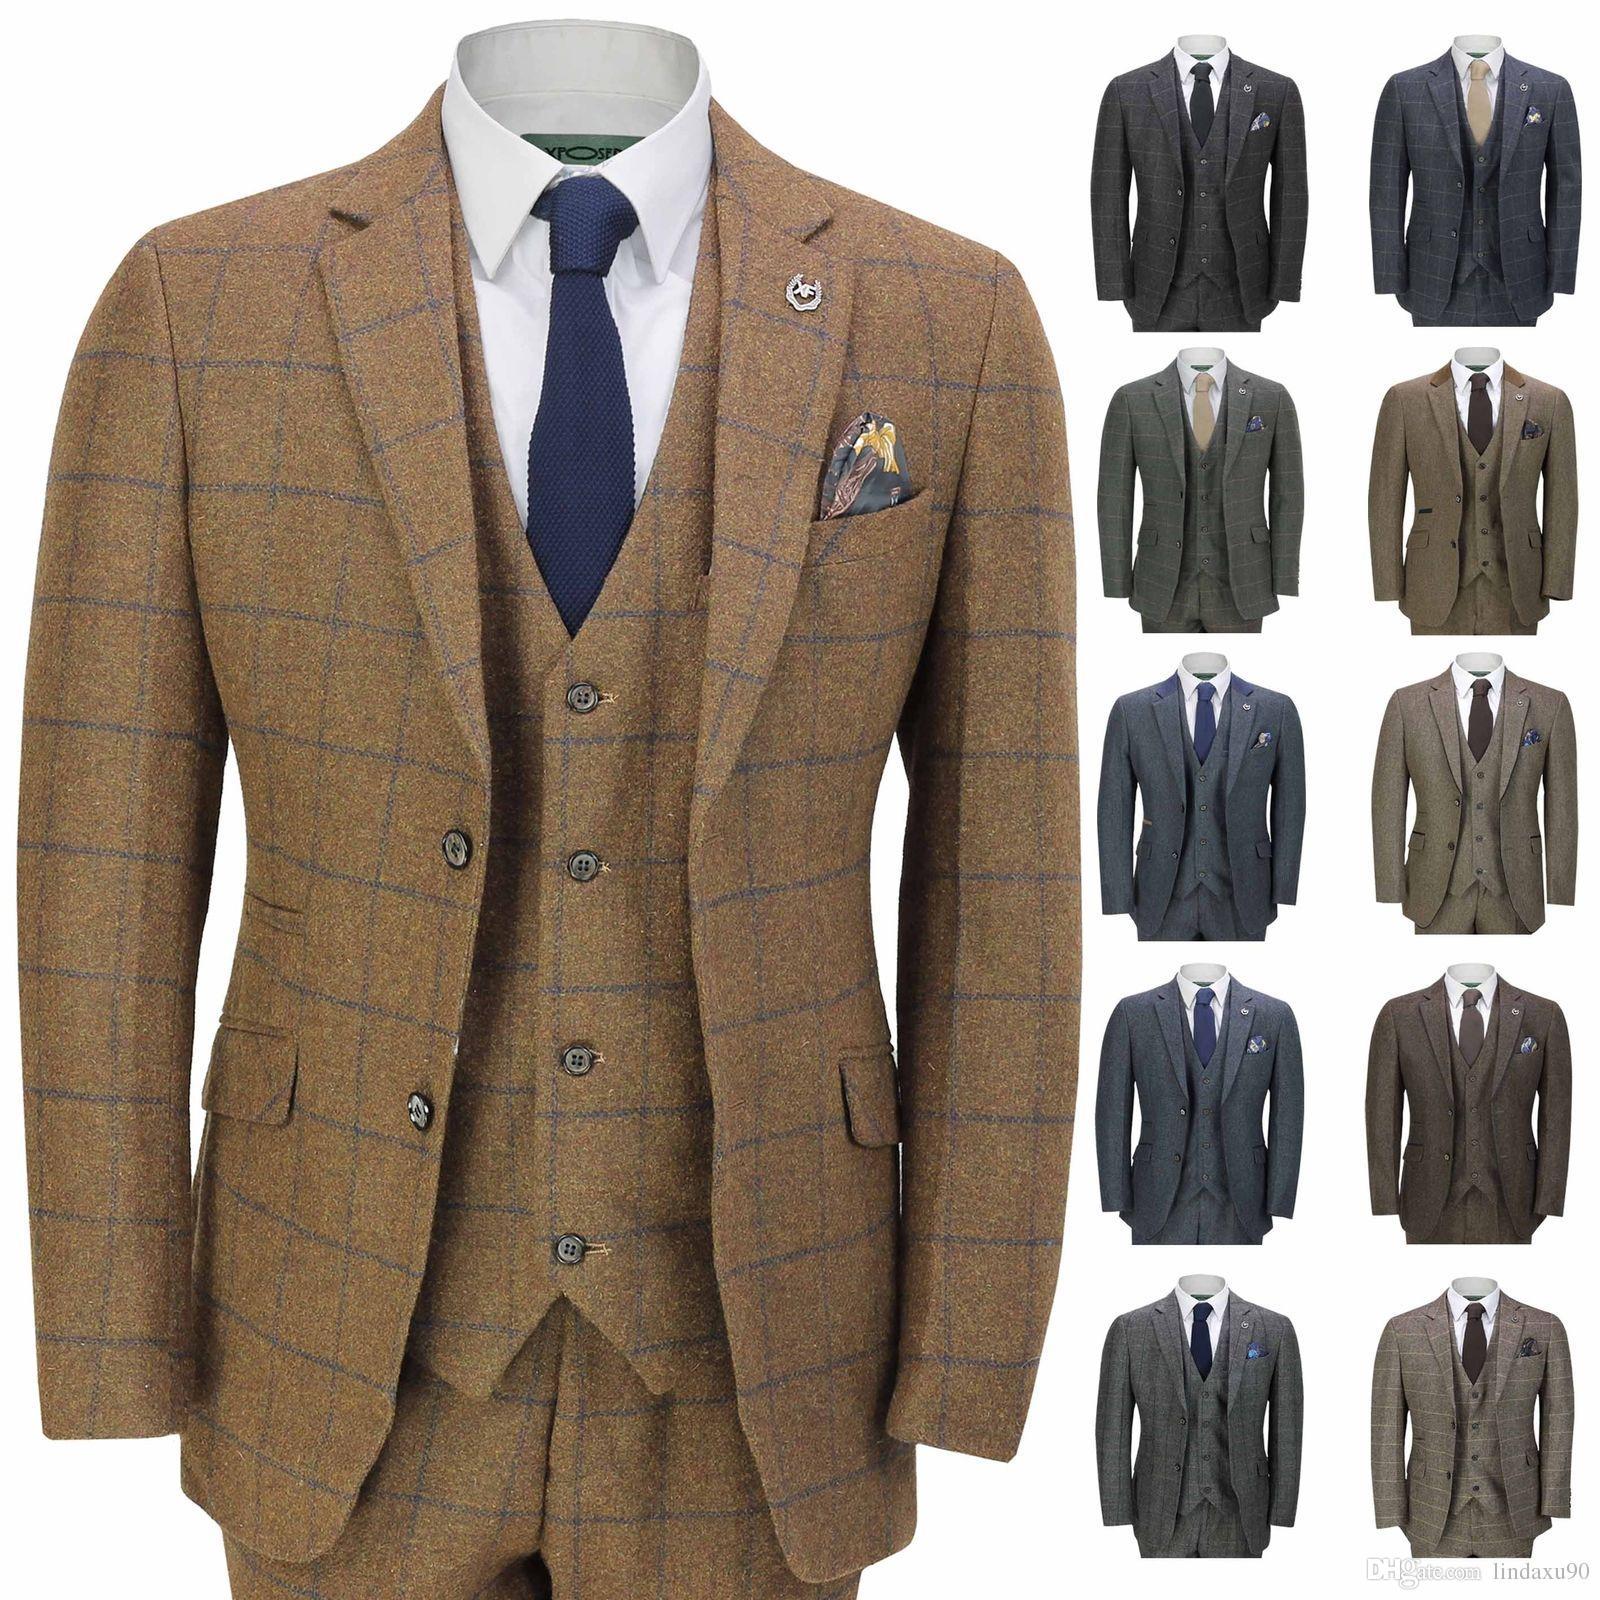 Xposed Mens Classic Tweed 3 Piece Suit Tan Brown Herringbone Navy Check Retro Peaky Blinders Tailored Fit